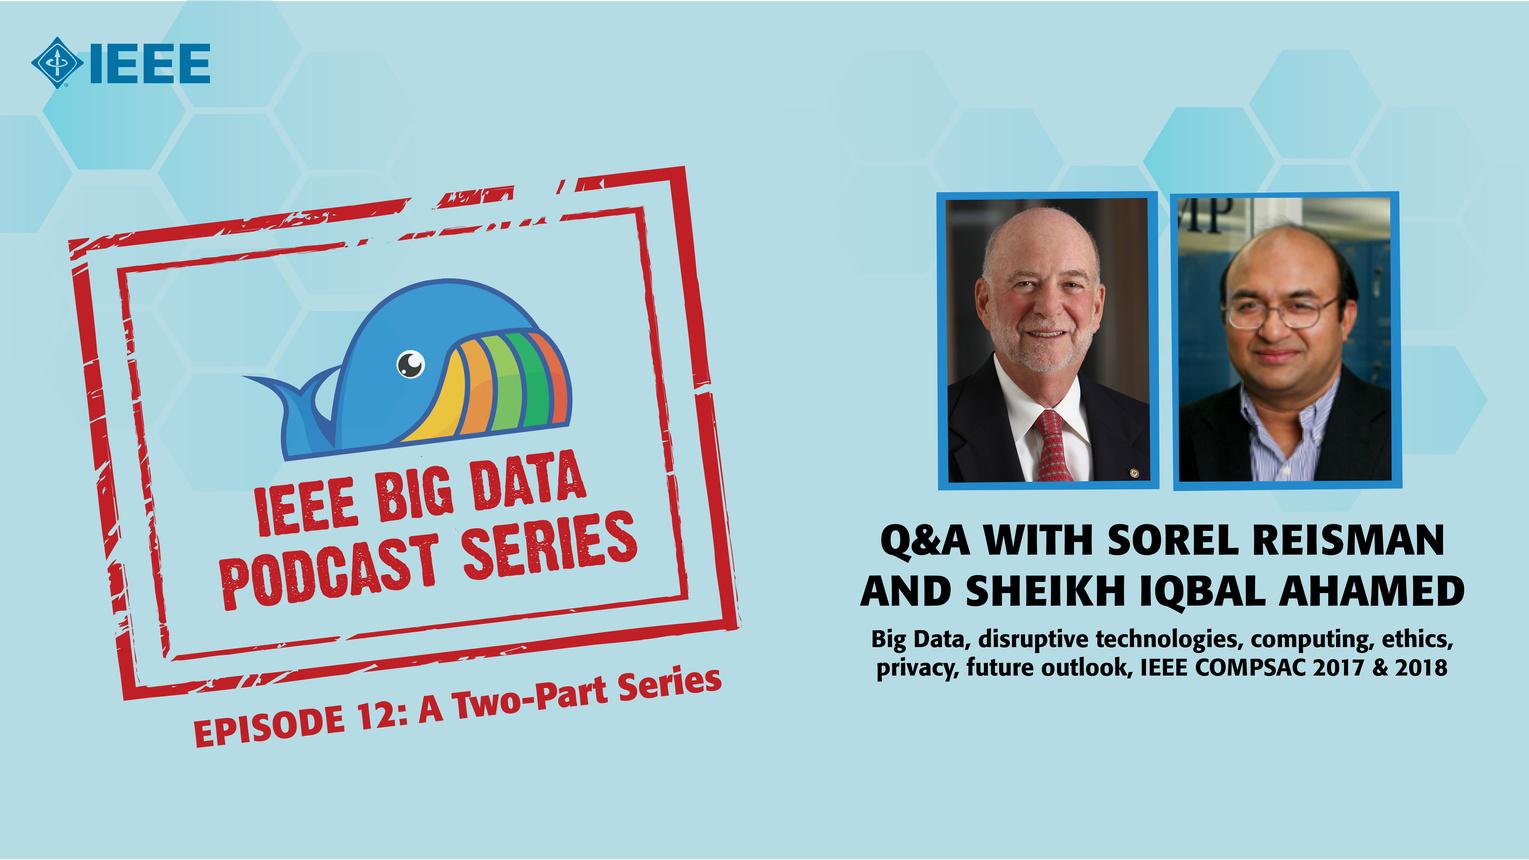 Q&A with Sorel Reisman & Sheikh Iqbal Ahamed, Part 2: IEEE Big Data Podcast, Episode 12